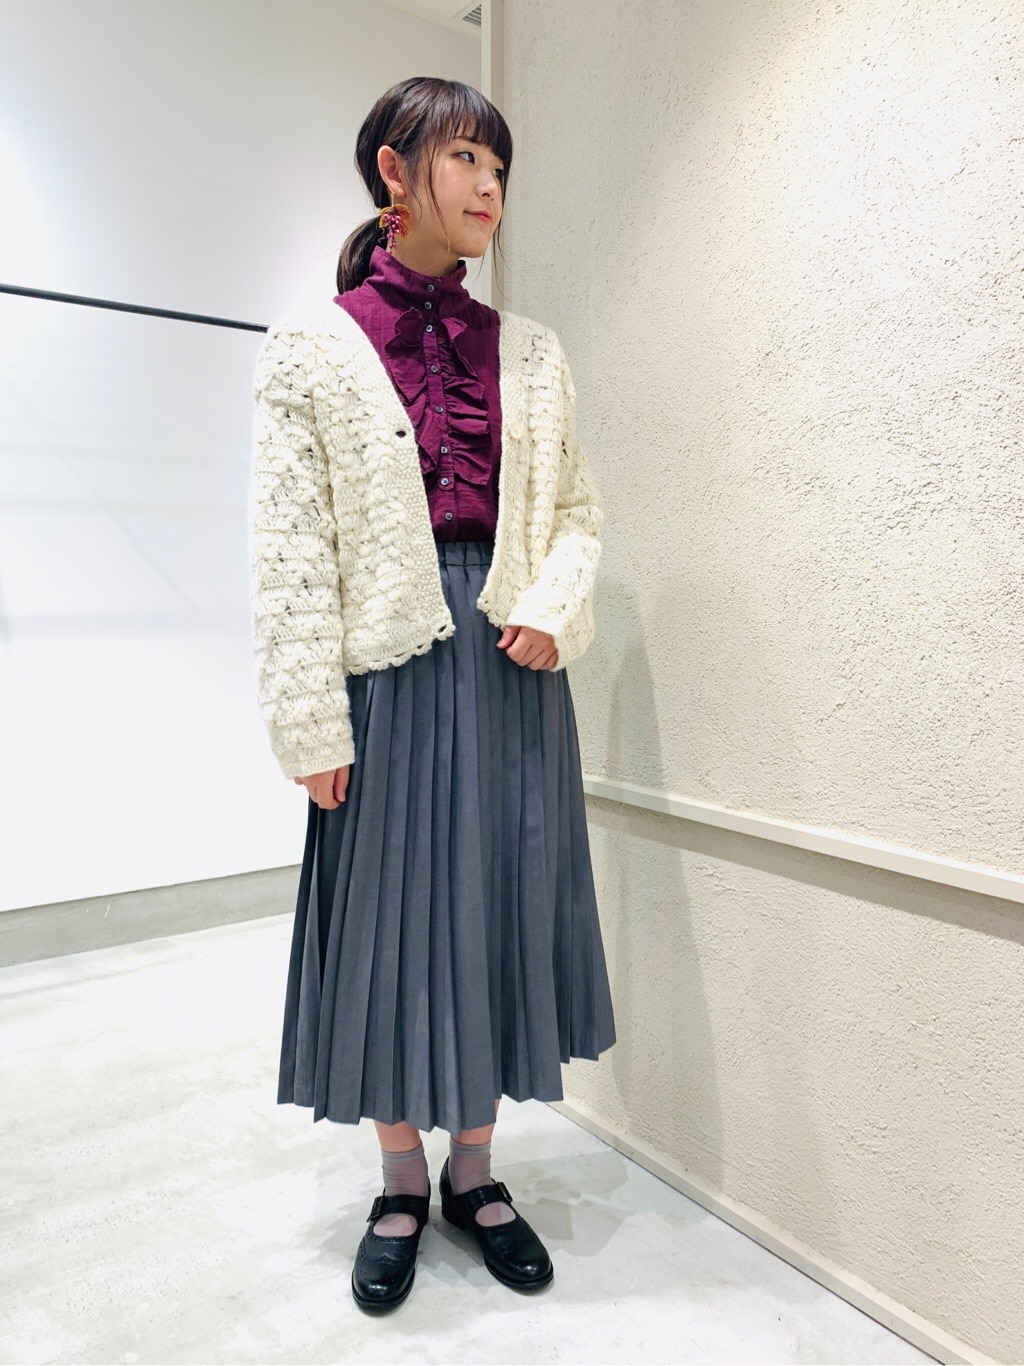 chambre de charme 横浜ジョイナス 身長:162cm 2020.09.28